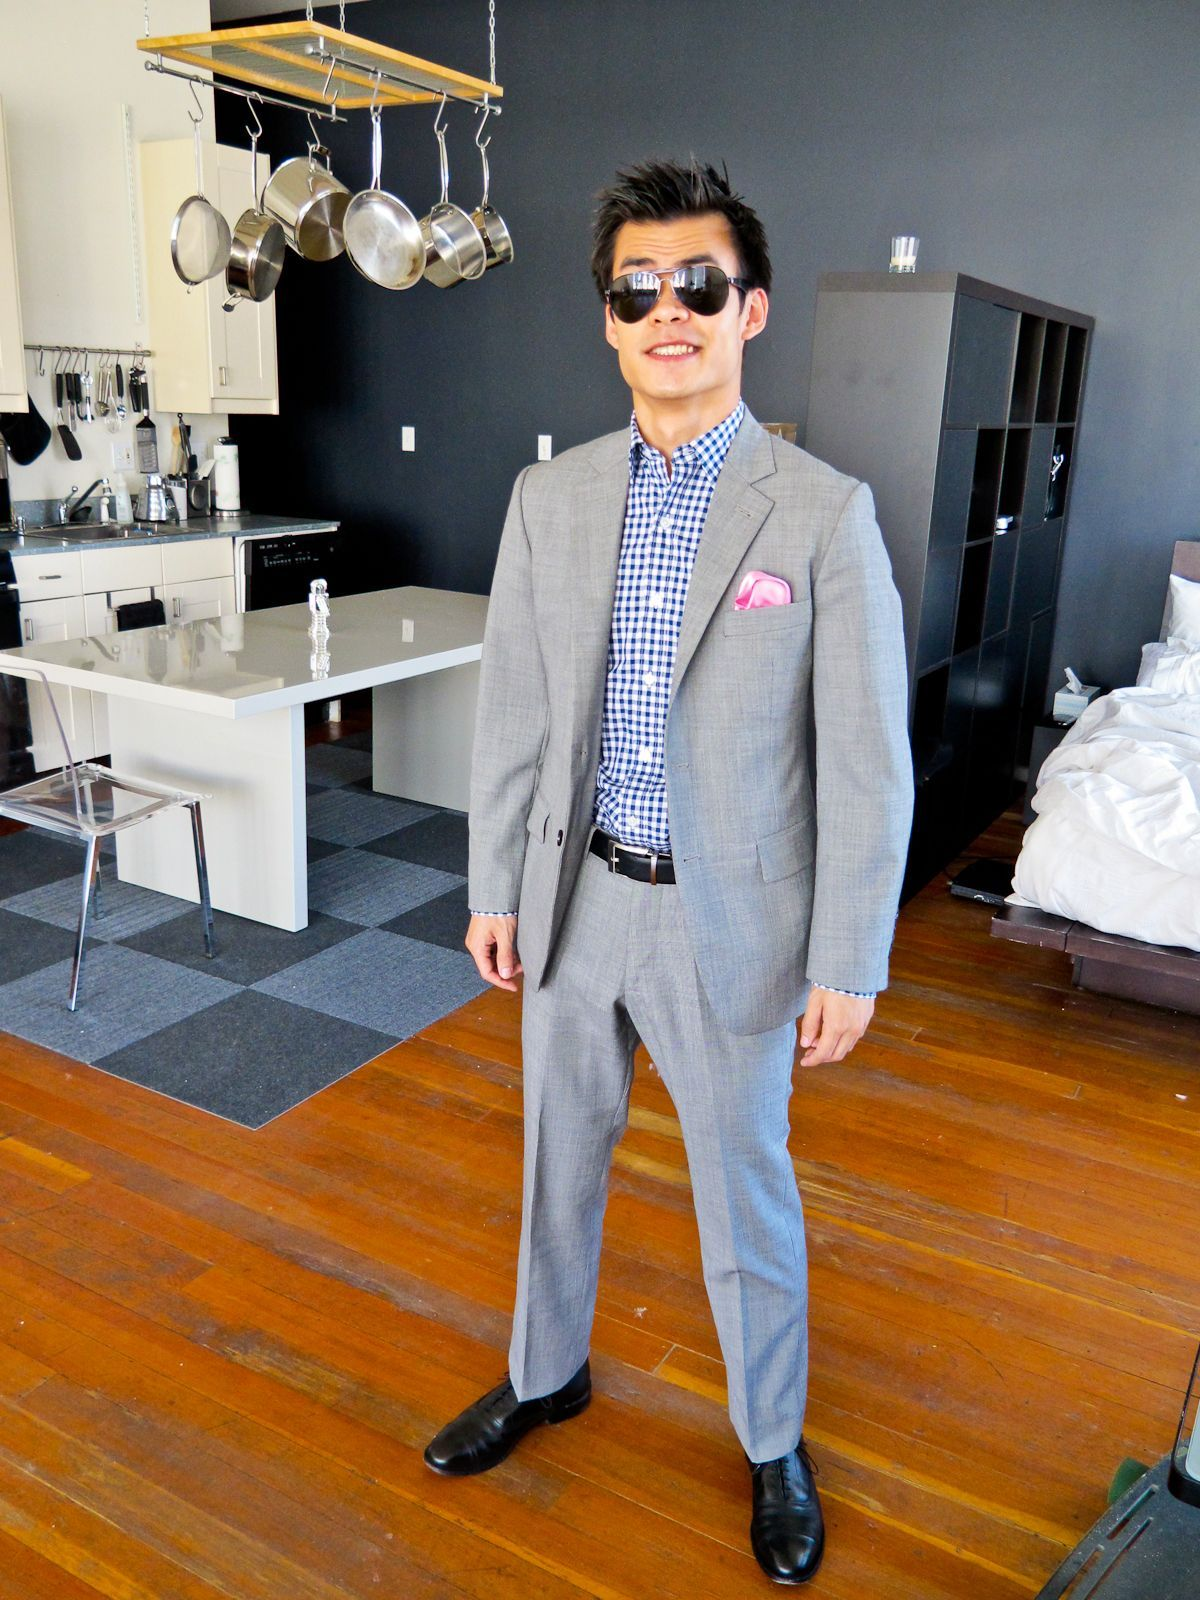 Veroz Reddit Tweed Suit With Linen Shirt Tweed Suits Fashion Linen Shirt